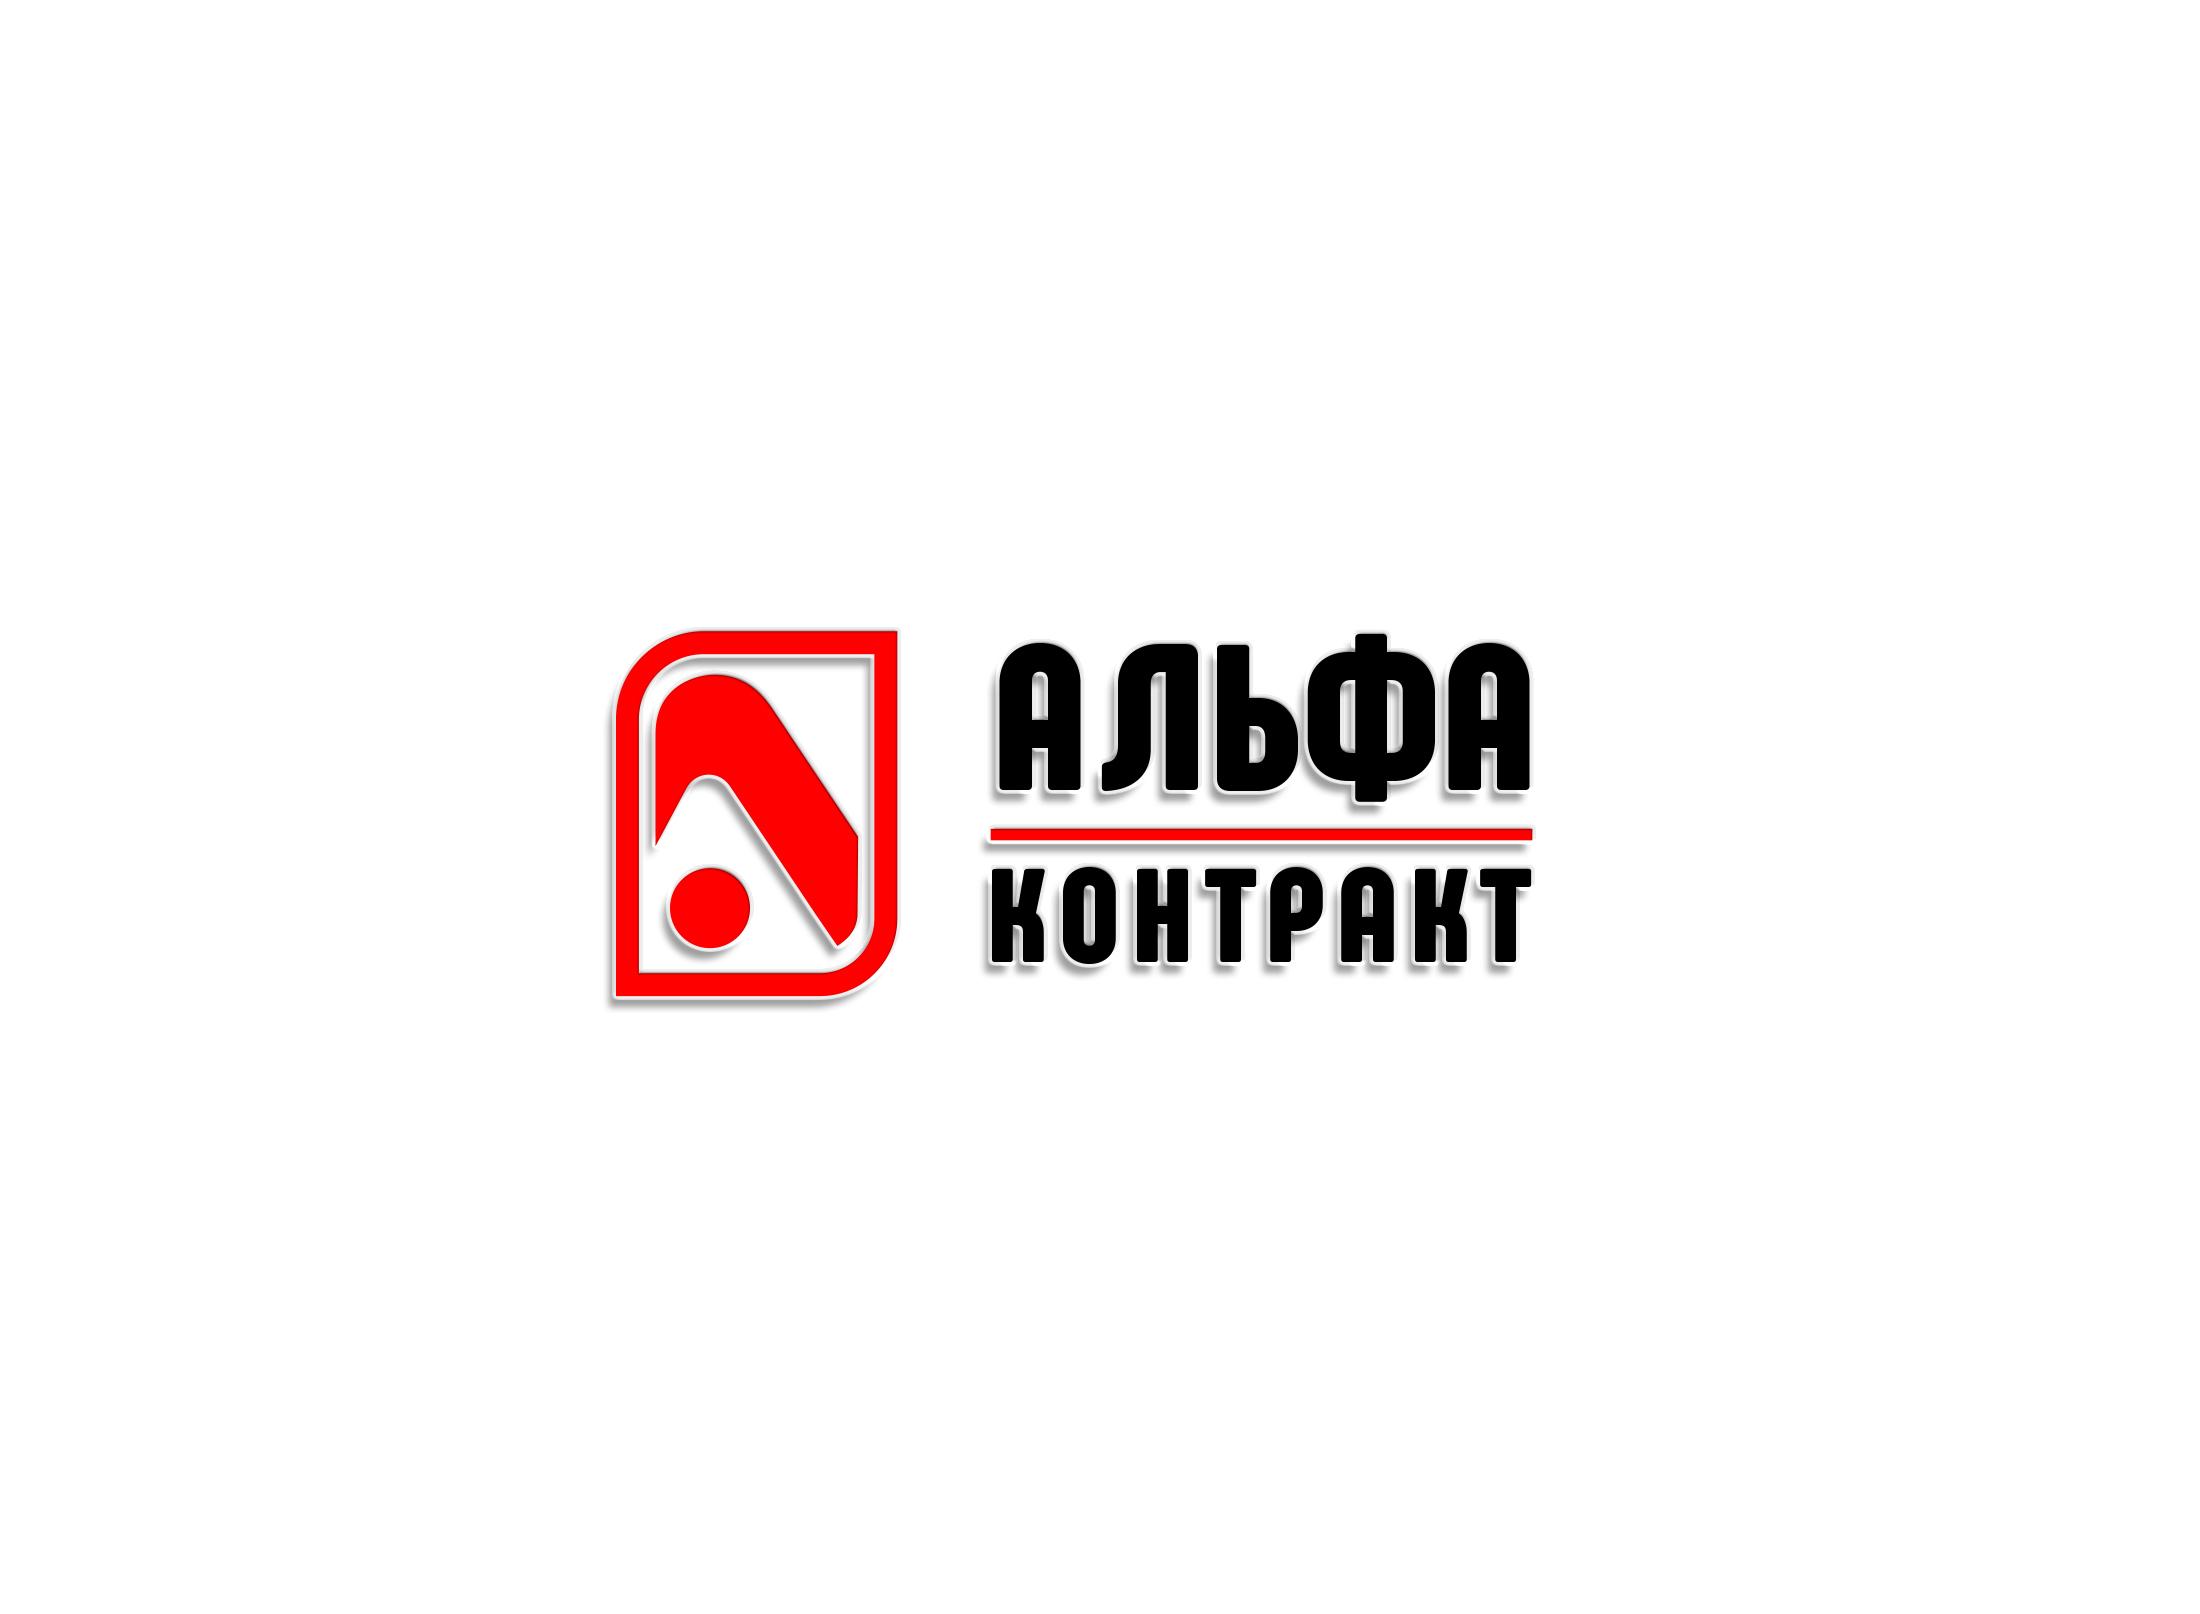 Дизайнер для разработки логотипа компании фото f_0305bff0002cfa9a.jpg